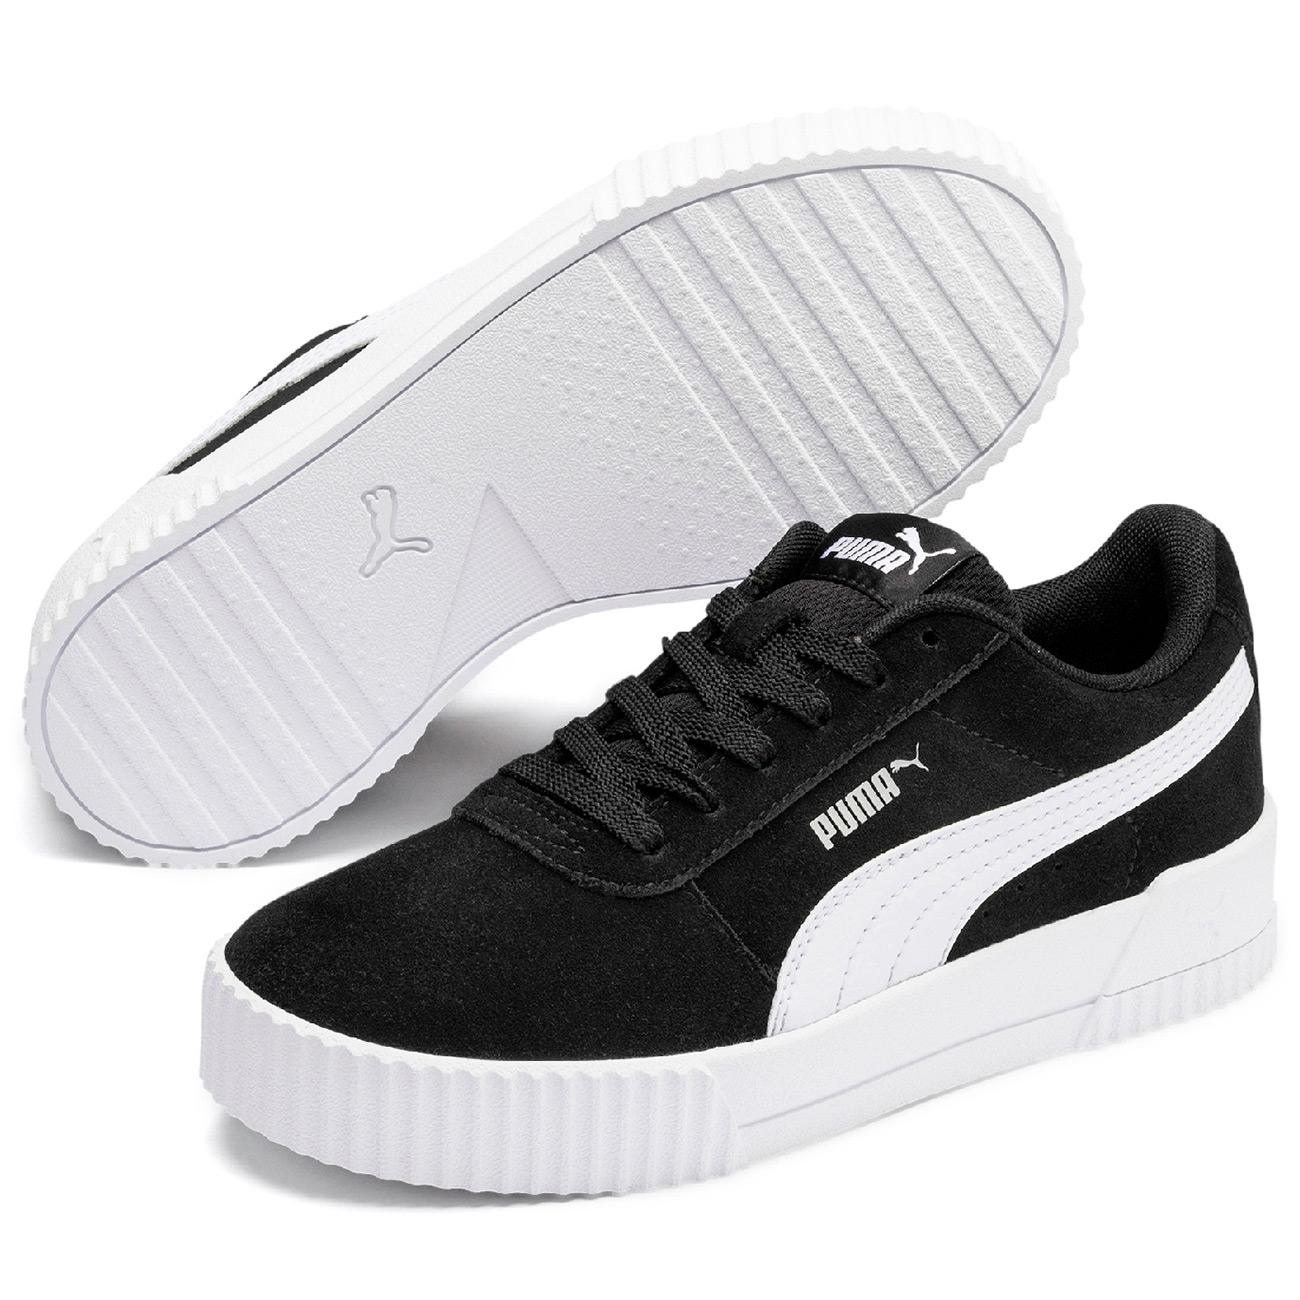 Puma Carina PS Sneakers Black/White